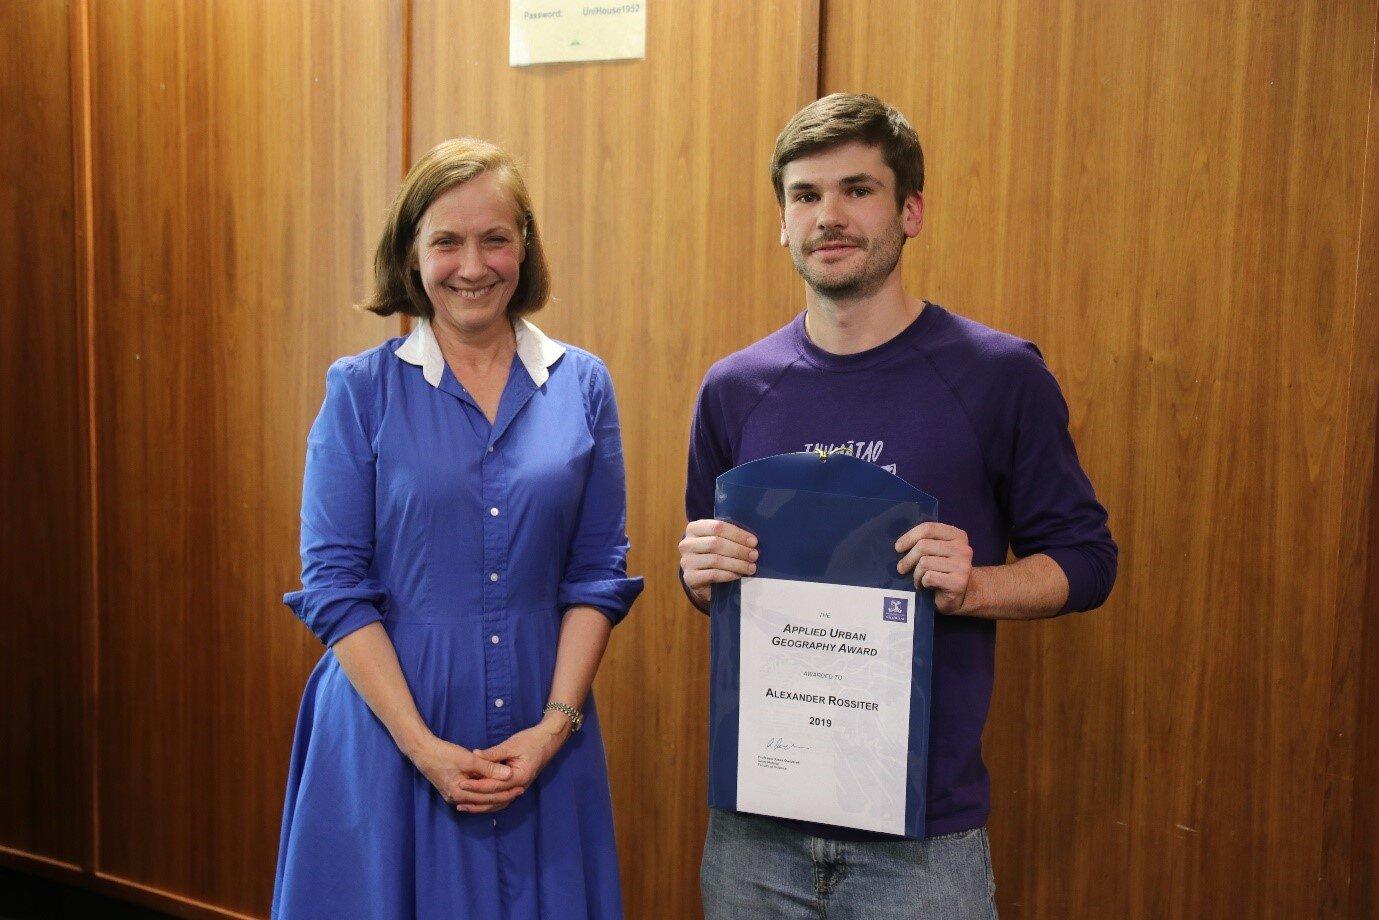 Geografia Board Director, Liz Grainger awards the prize to Alexander Rossiter